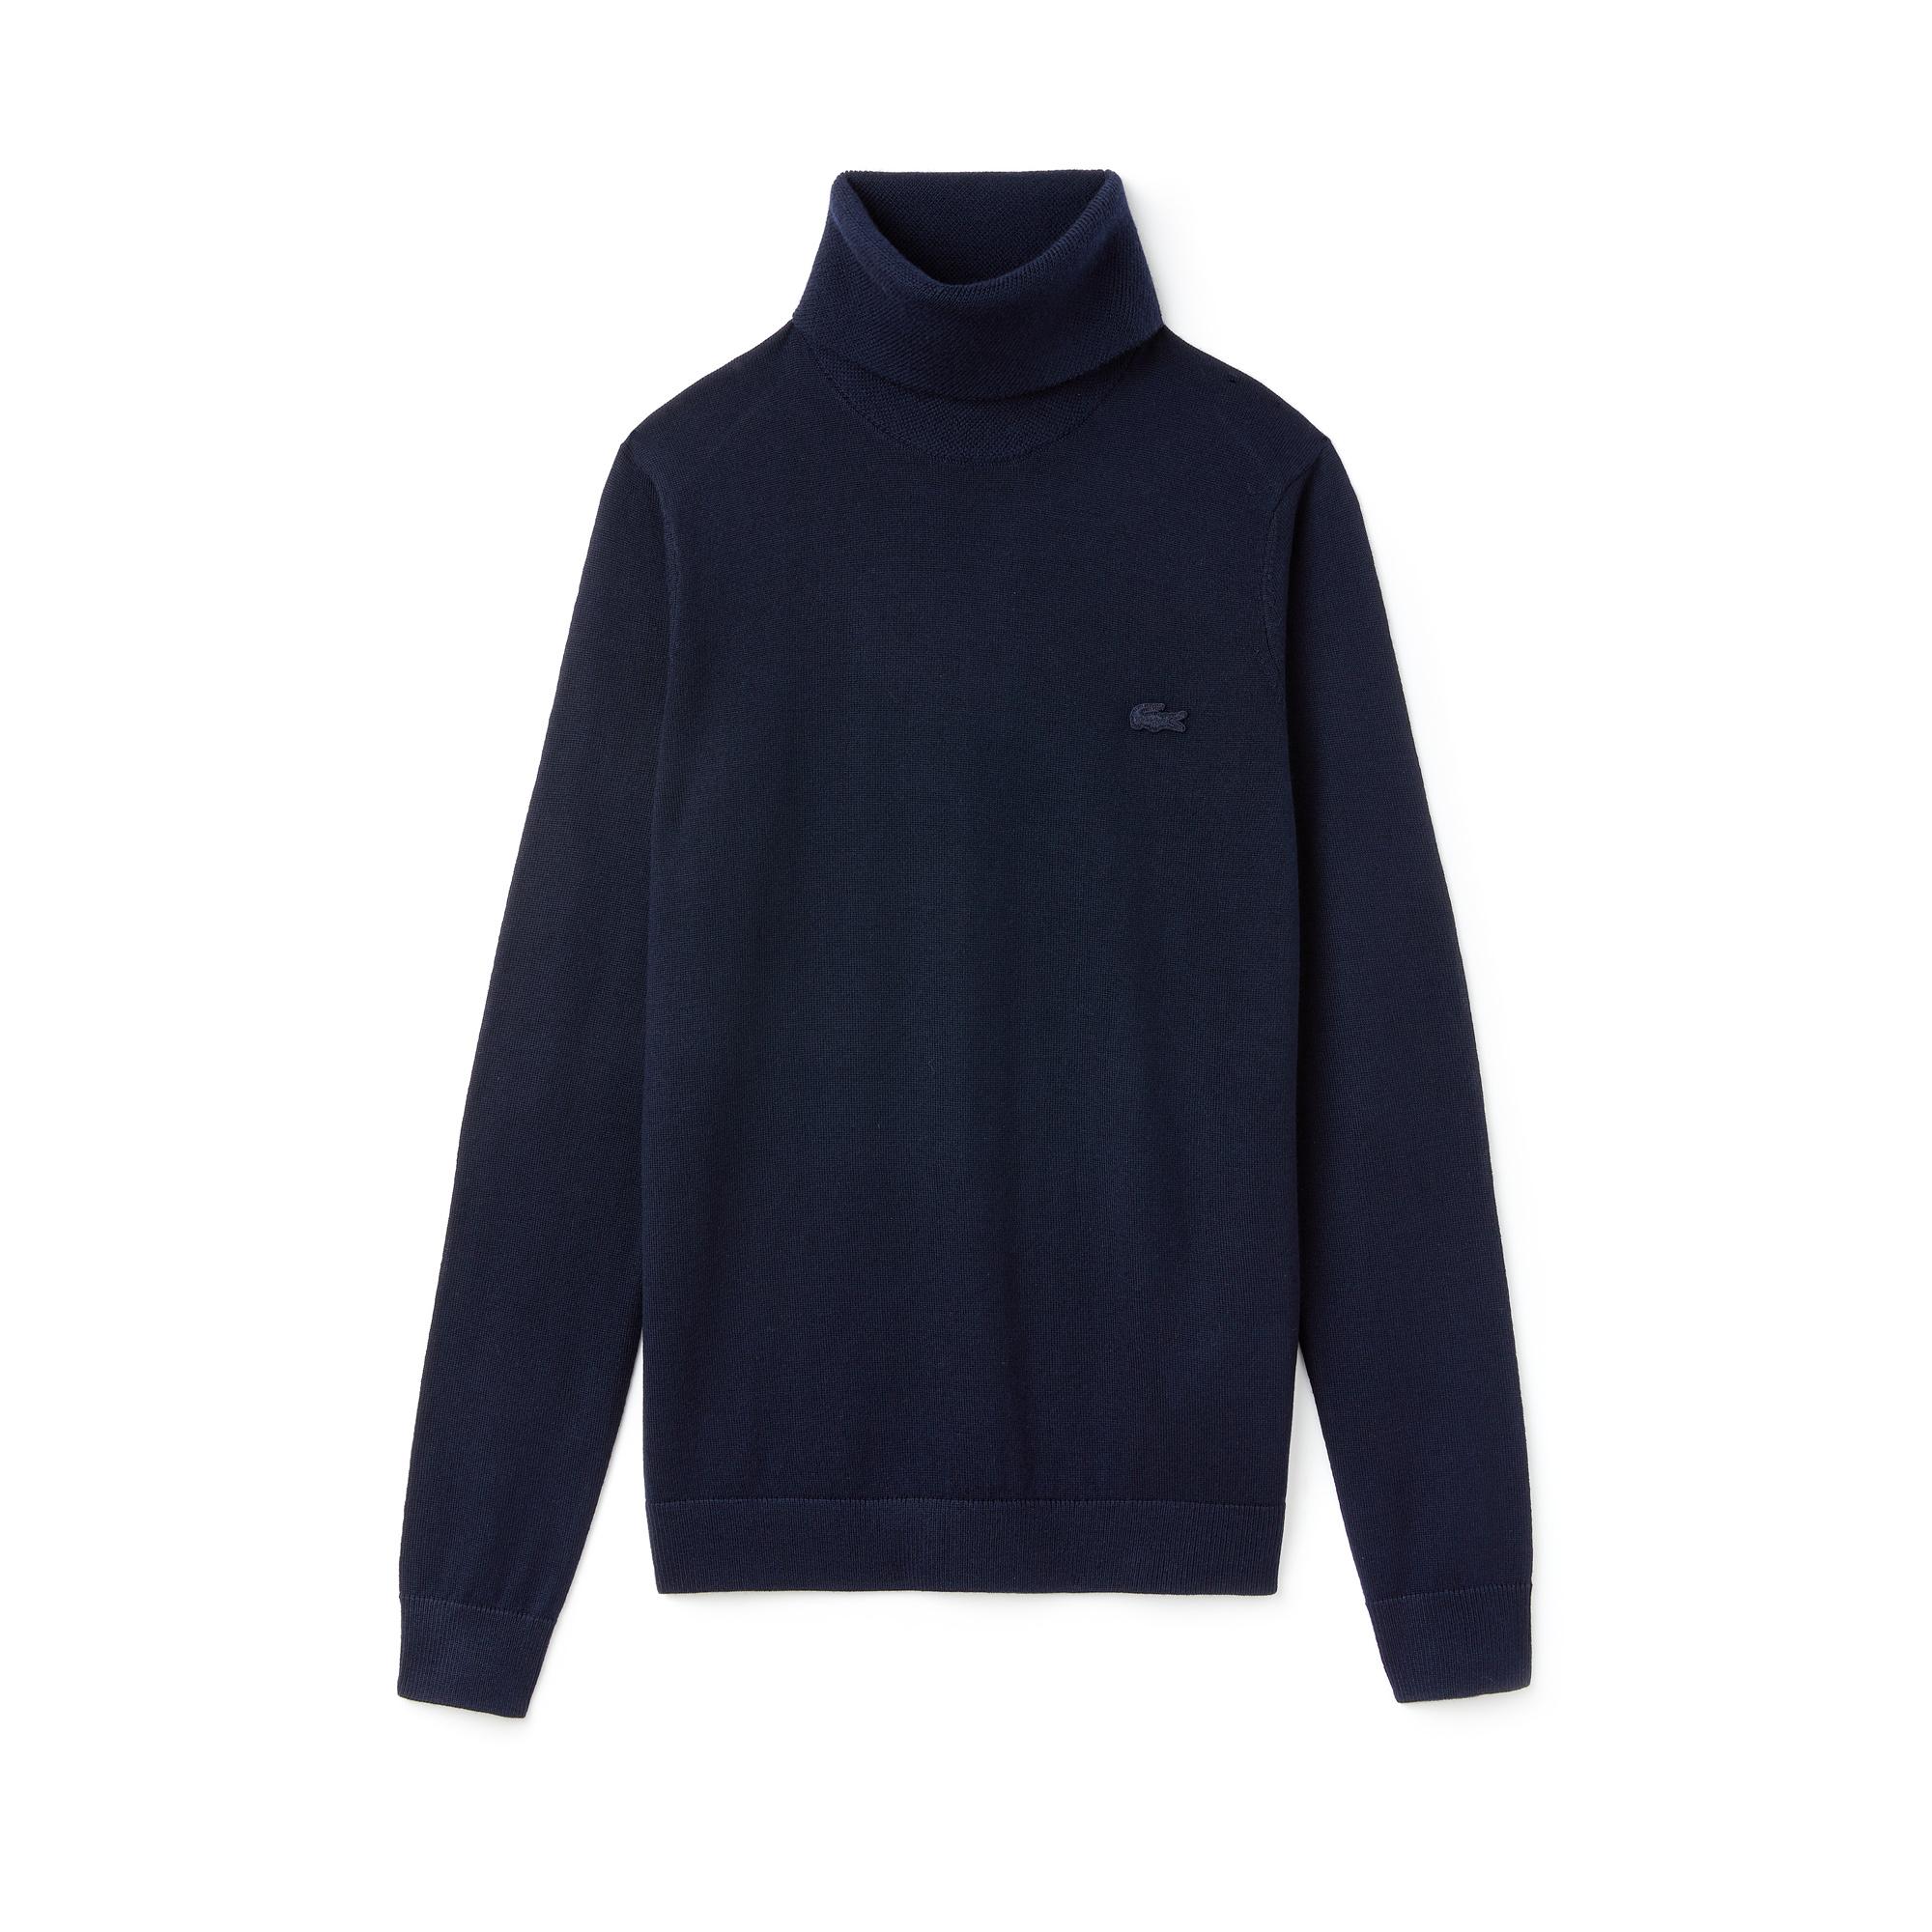 Фото 5 - Женский свитер Lacoste темно-синего цвета